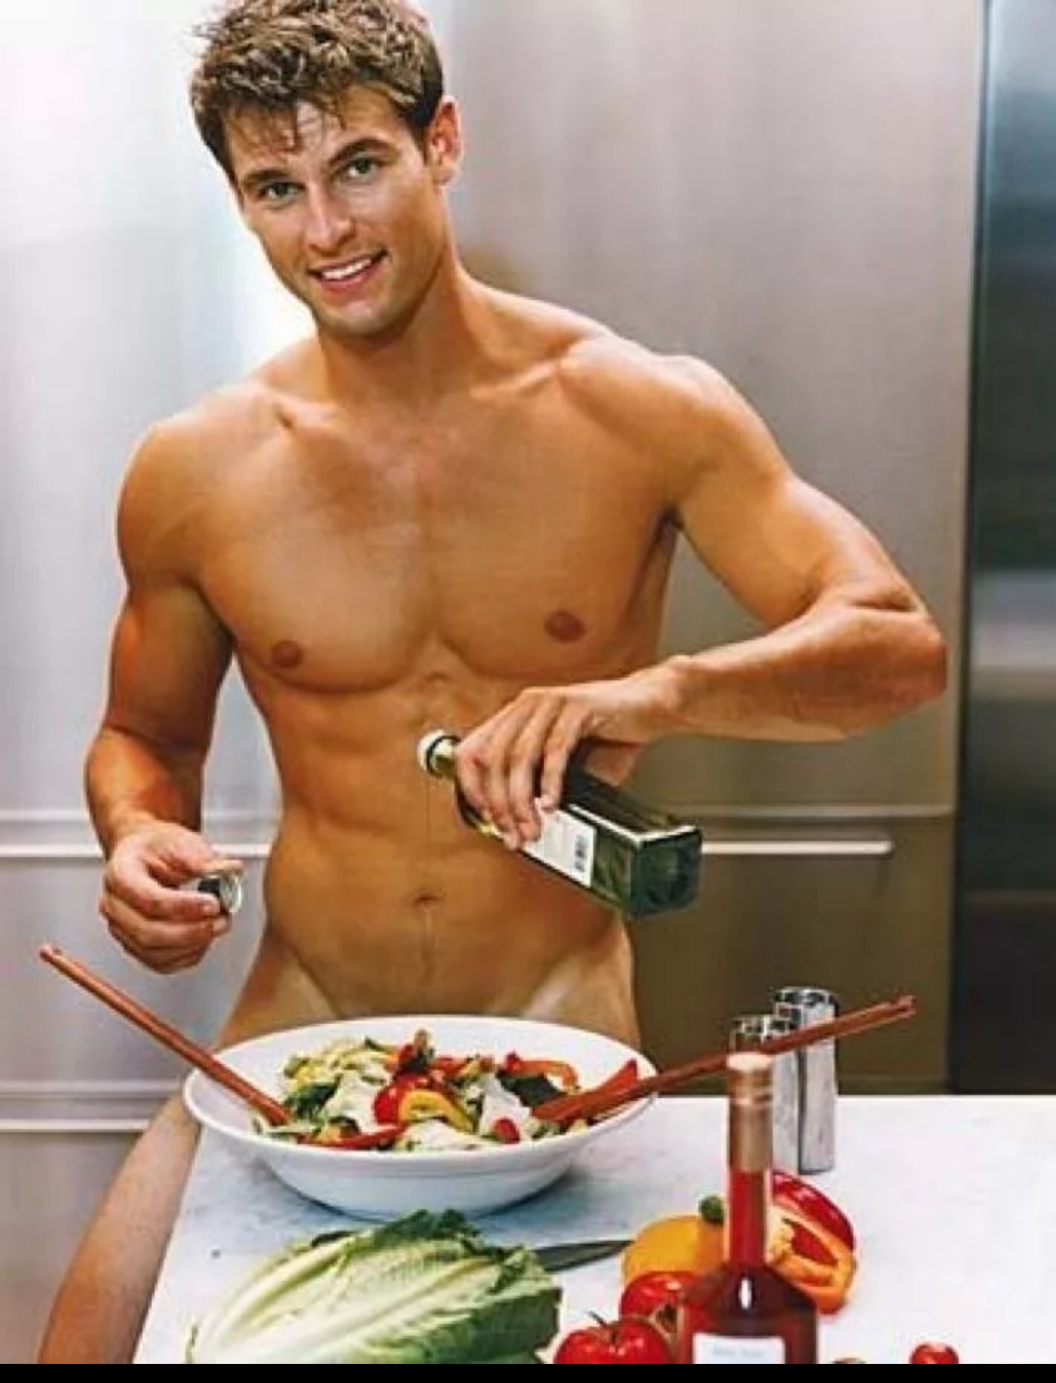 искали портал, голые парни на кухне там нее, утонешь